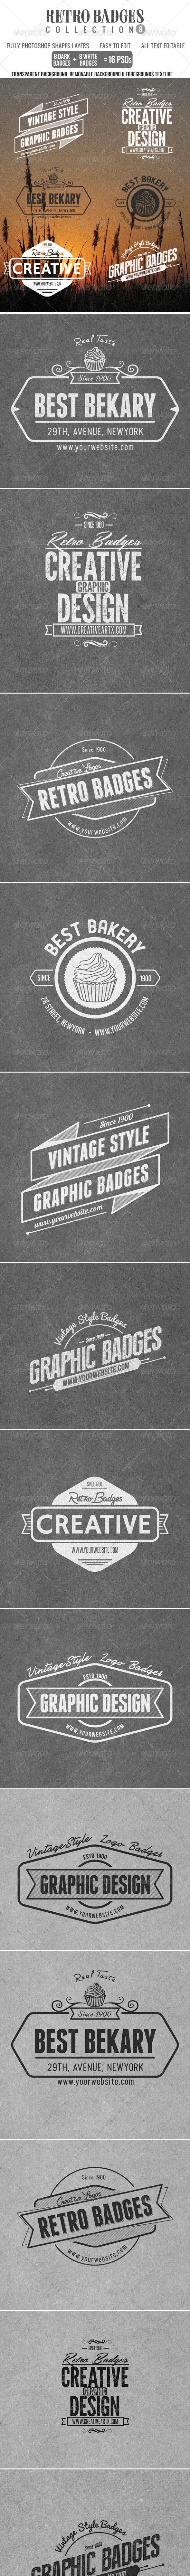 Retro Badges Col.8 - Badges & Stickers Web Elements